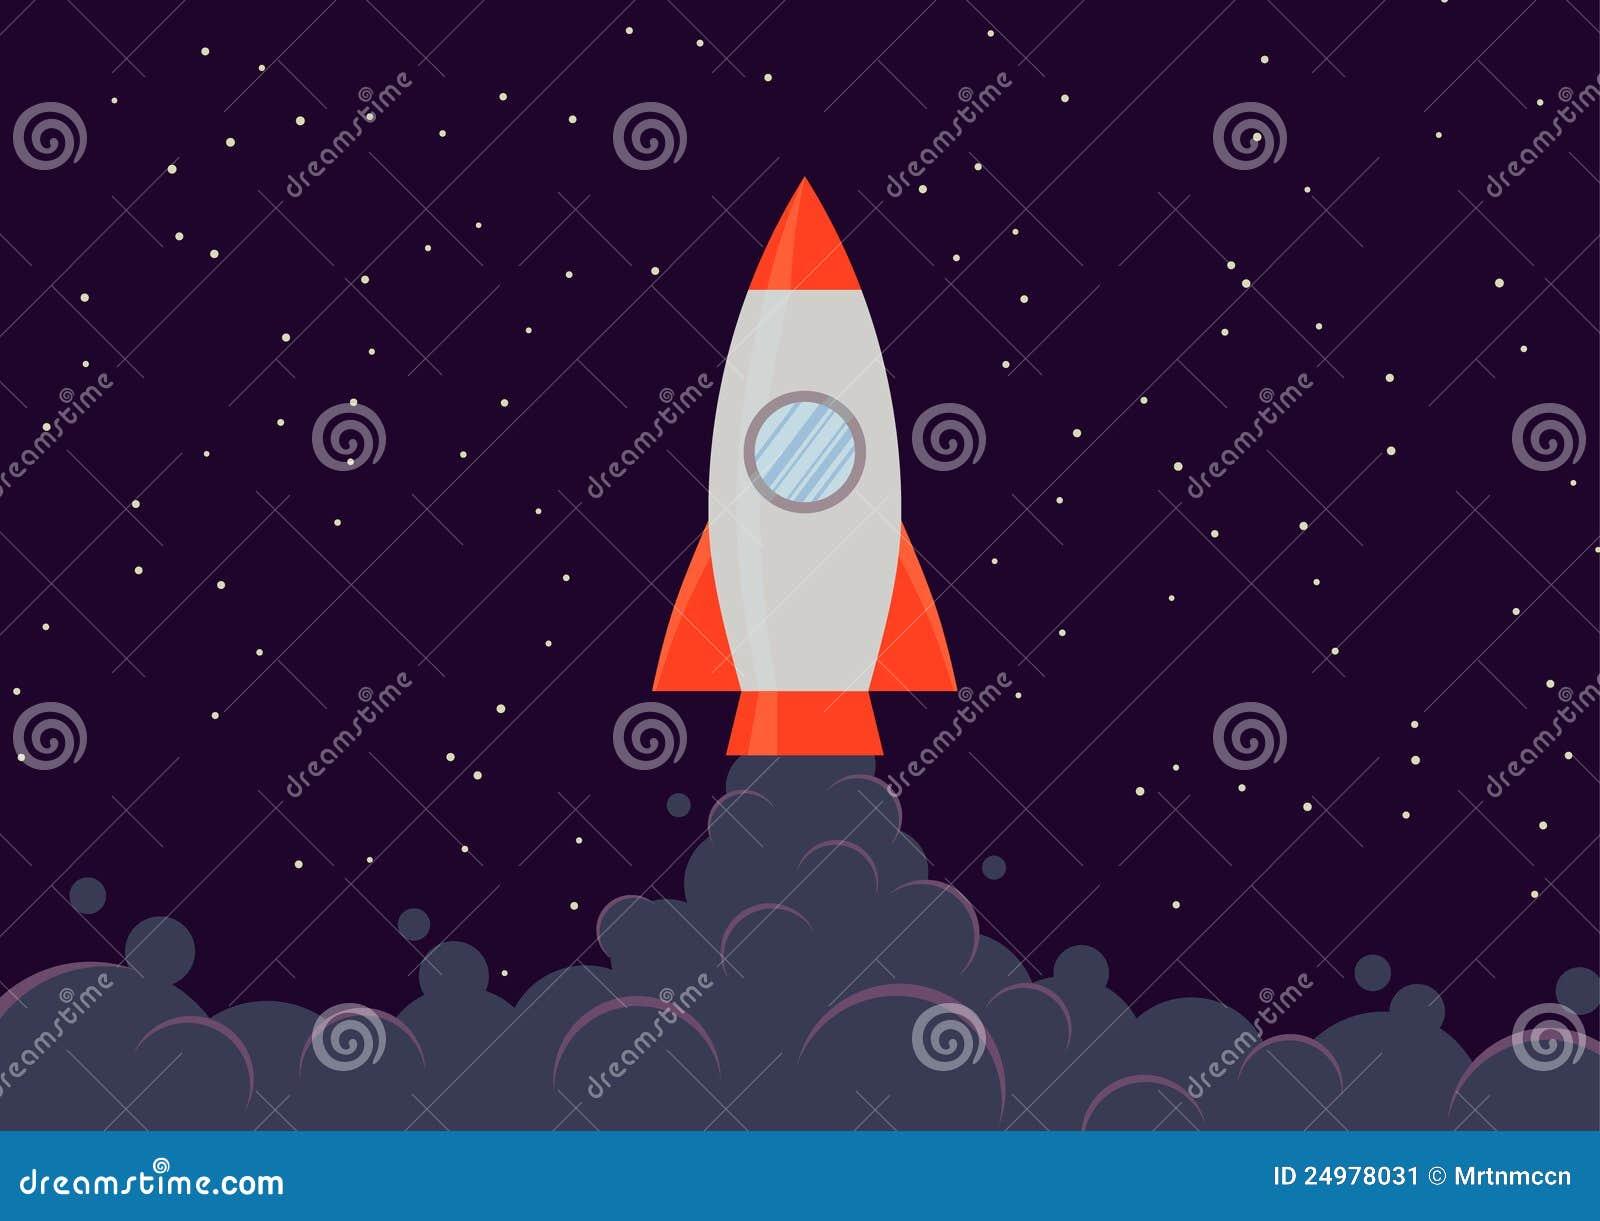 Rocket Ship Stock Image - Image: 24978031